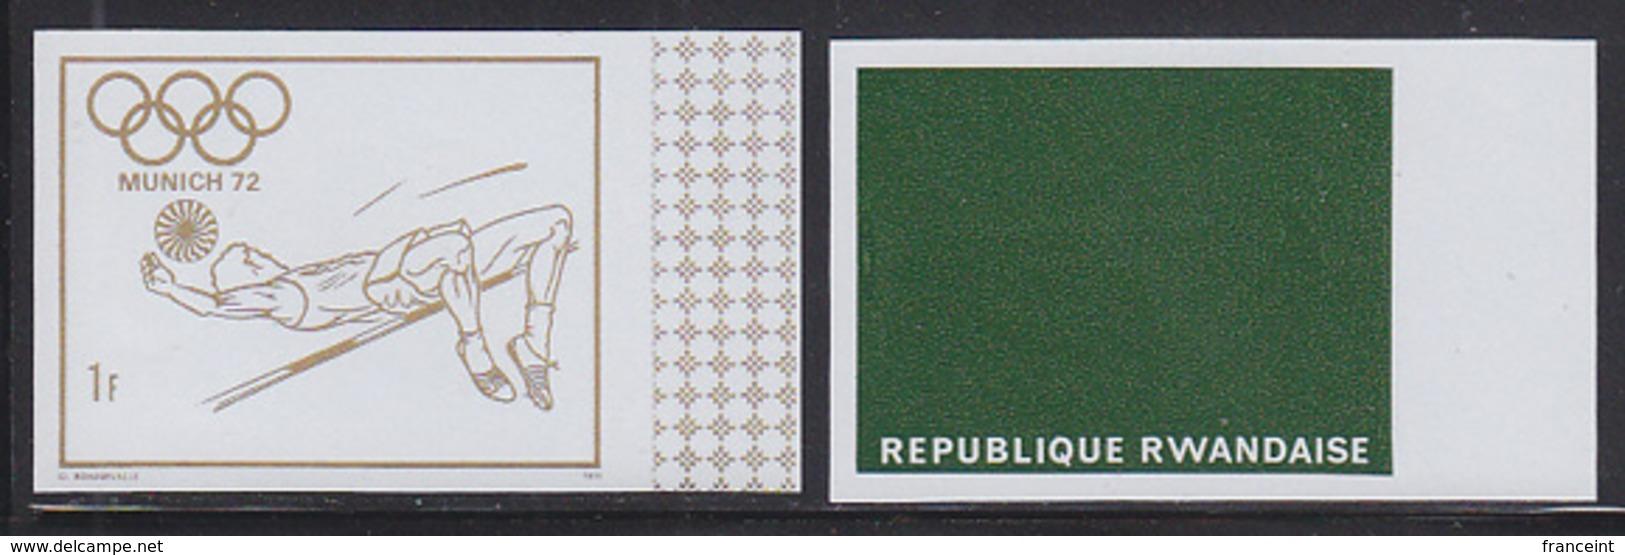 RWANDA (1972) High Jump. Imperforate Proofs Of Vignette And Background. Scott No 481. Munich Olympics. - Summer 1972: Munich